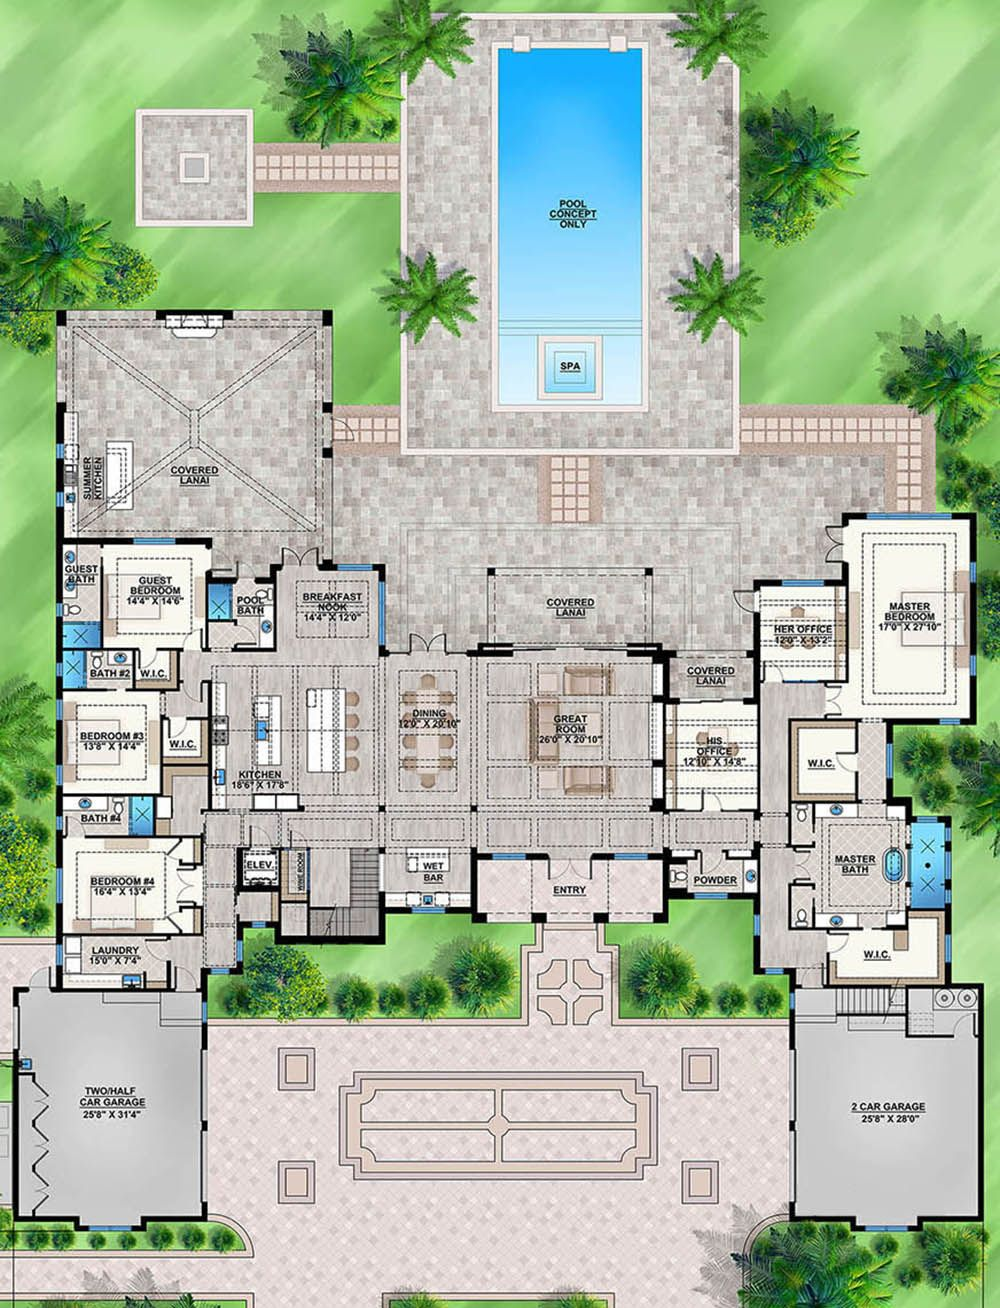 House Plan 207 00067 Luxury Plan 8 285 Square Feet 7 Bedrooms 8 5 Bathrooms Luxury Floor Plans Luxury House Plans Mansion Floor Plan